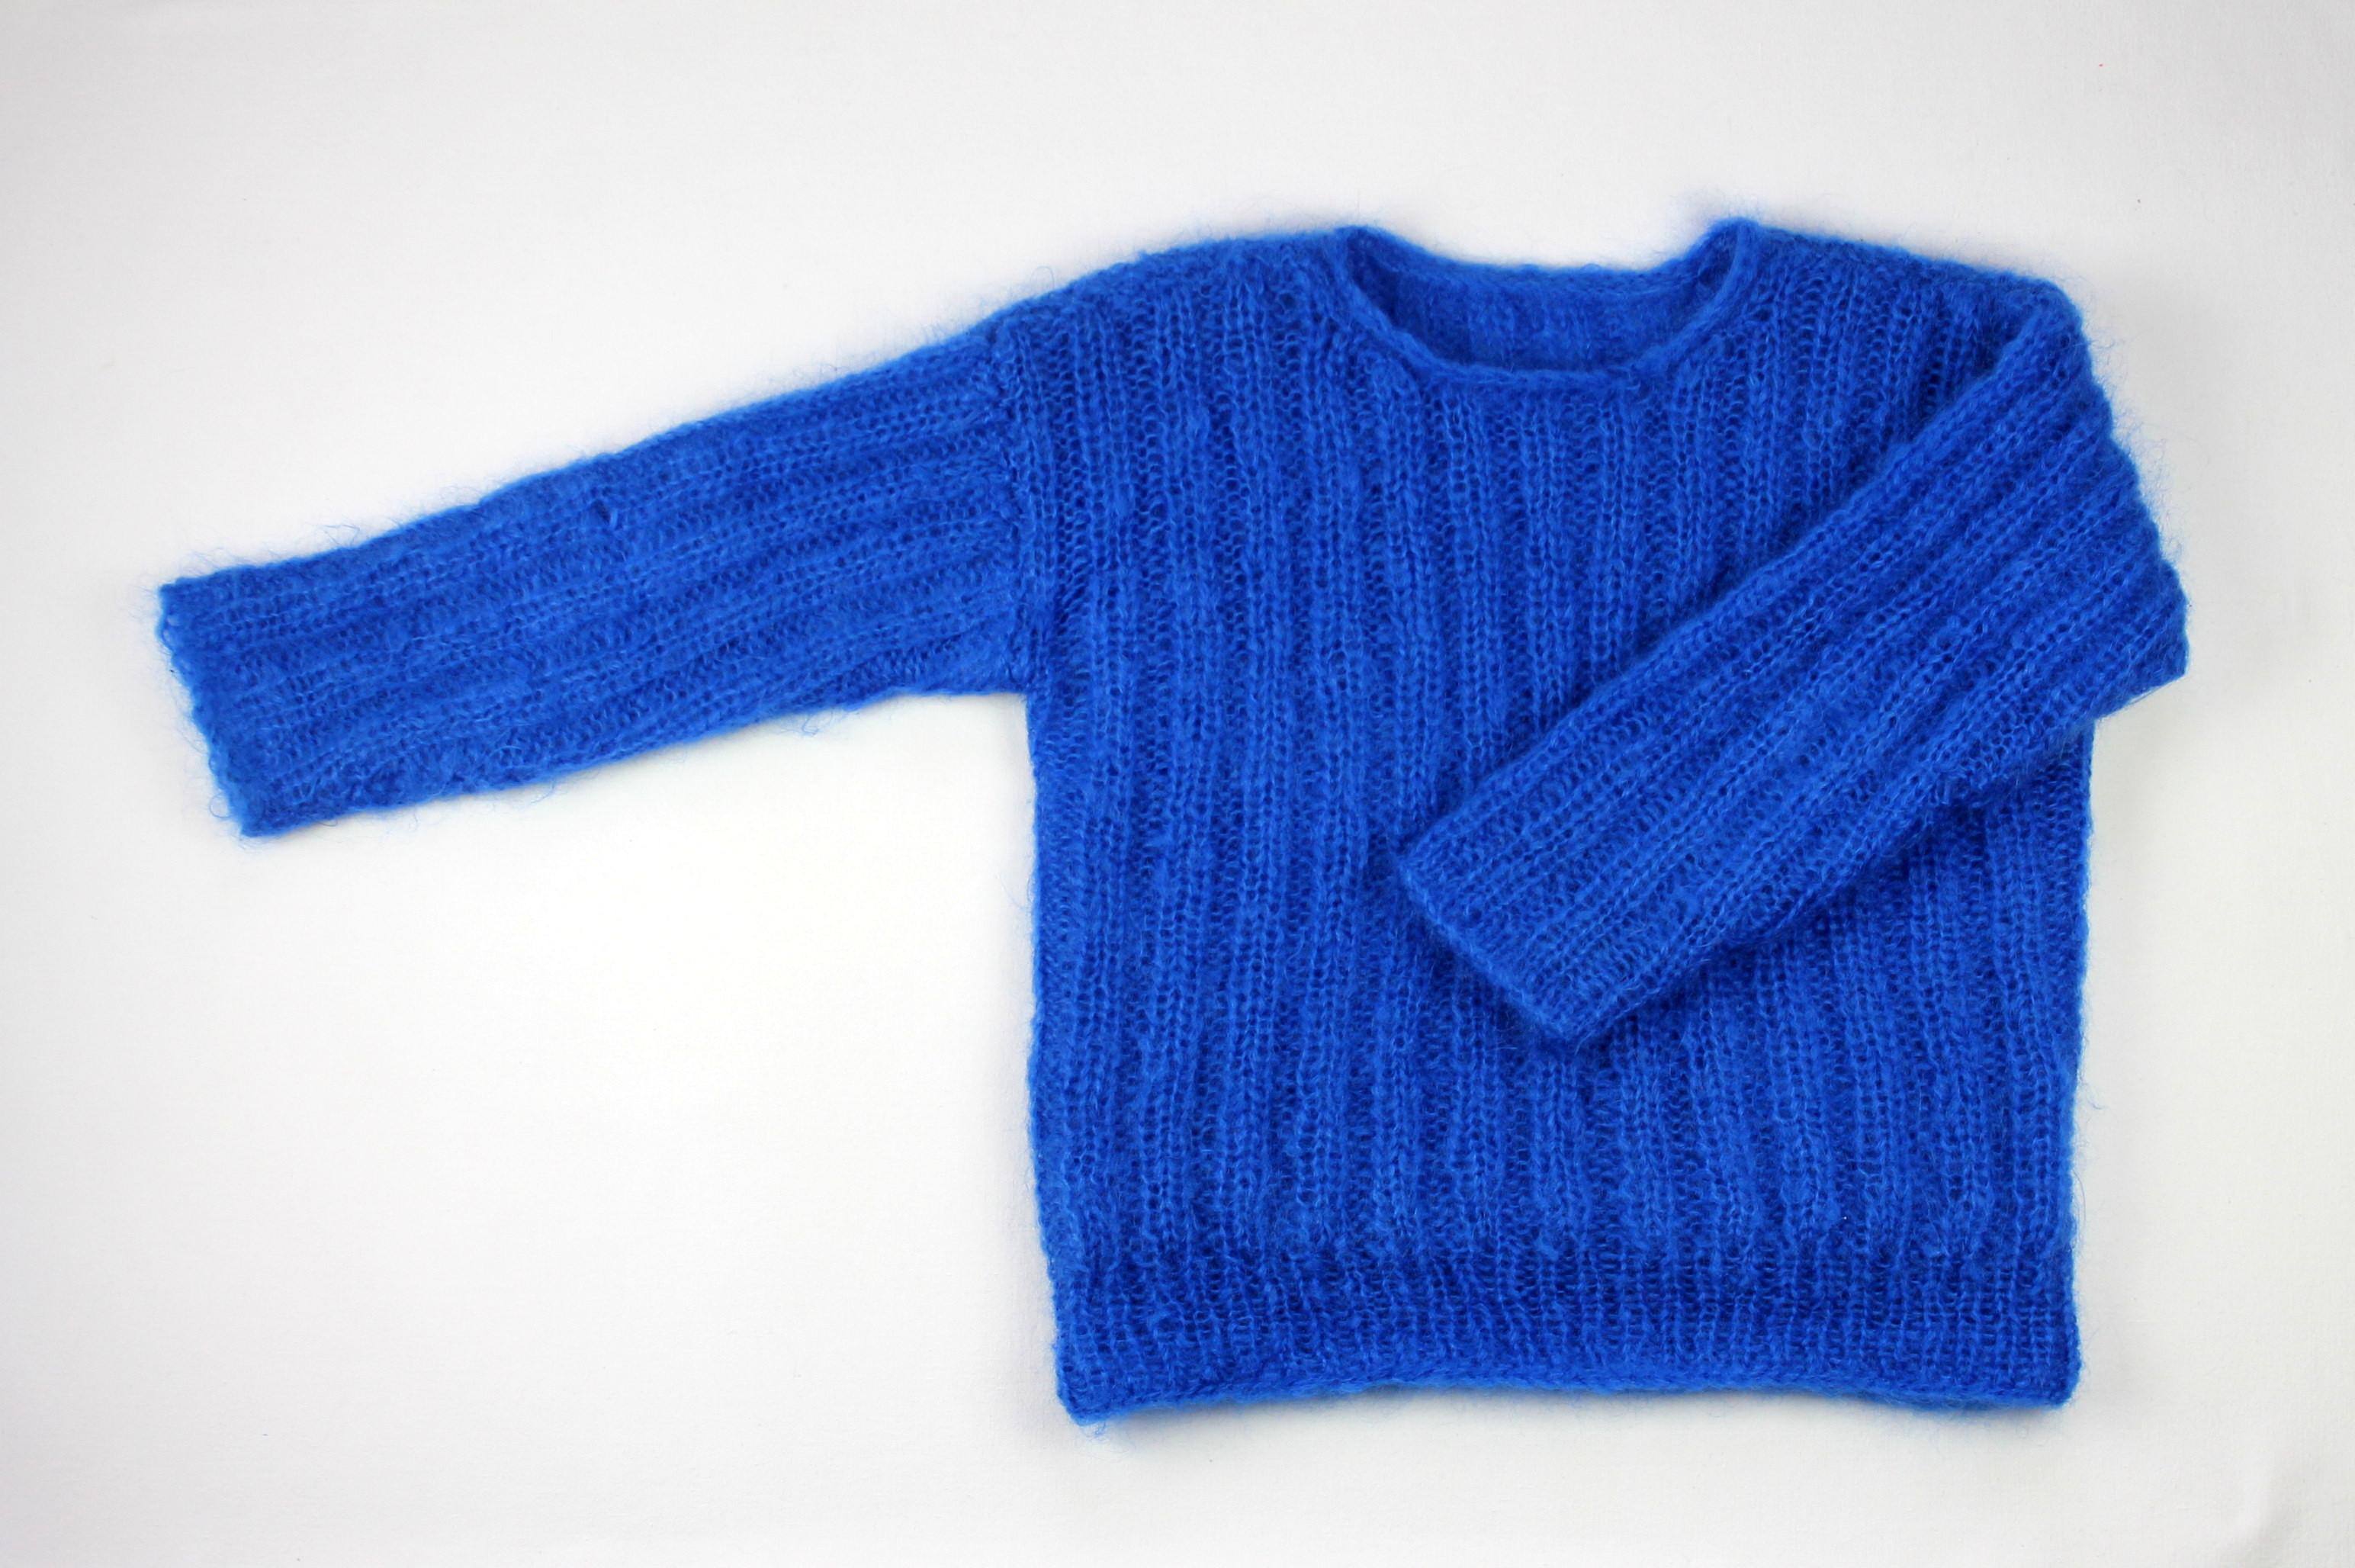 un pull bleu  u00e9lectrique  u2013 damn good caramel